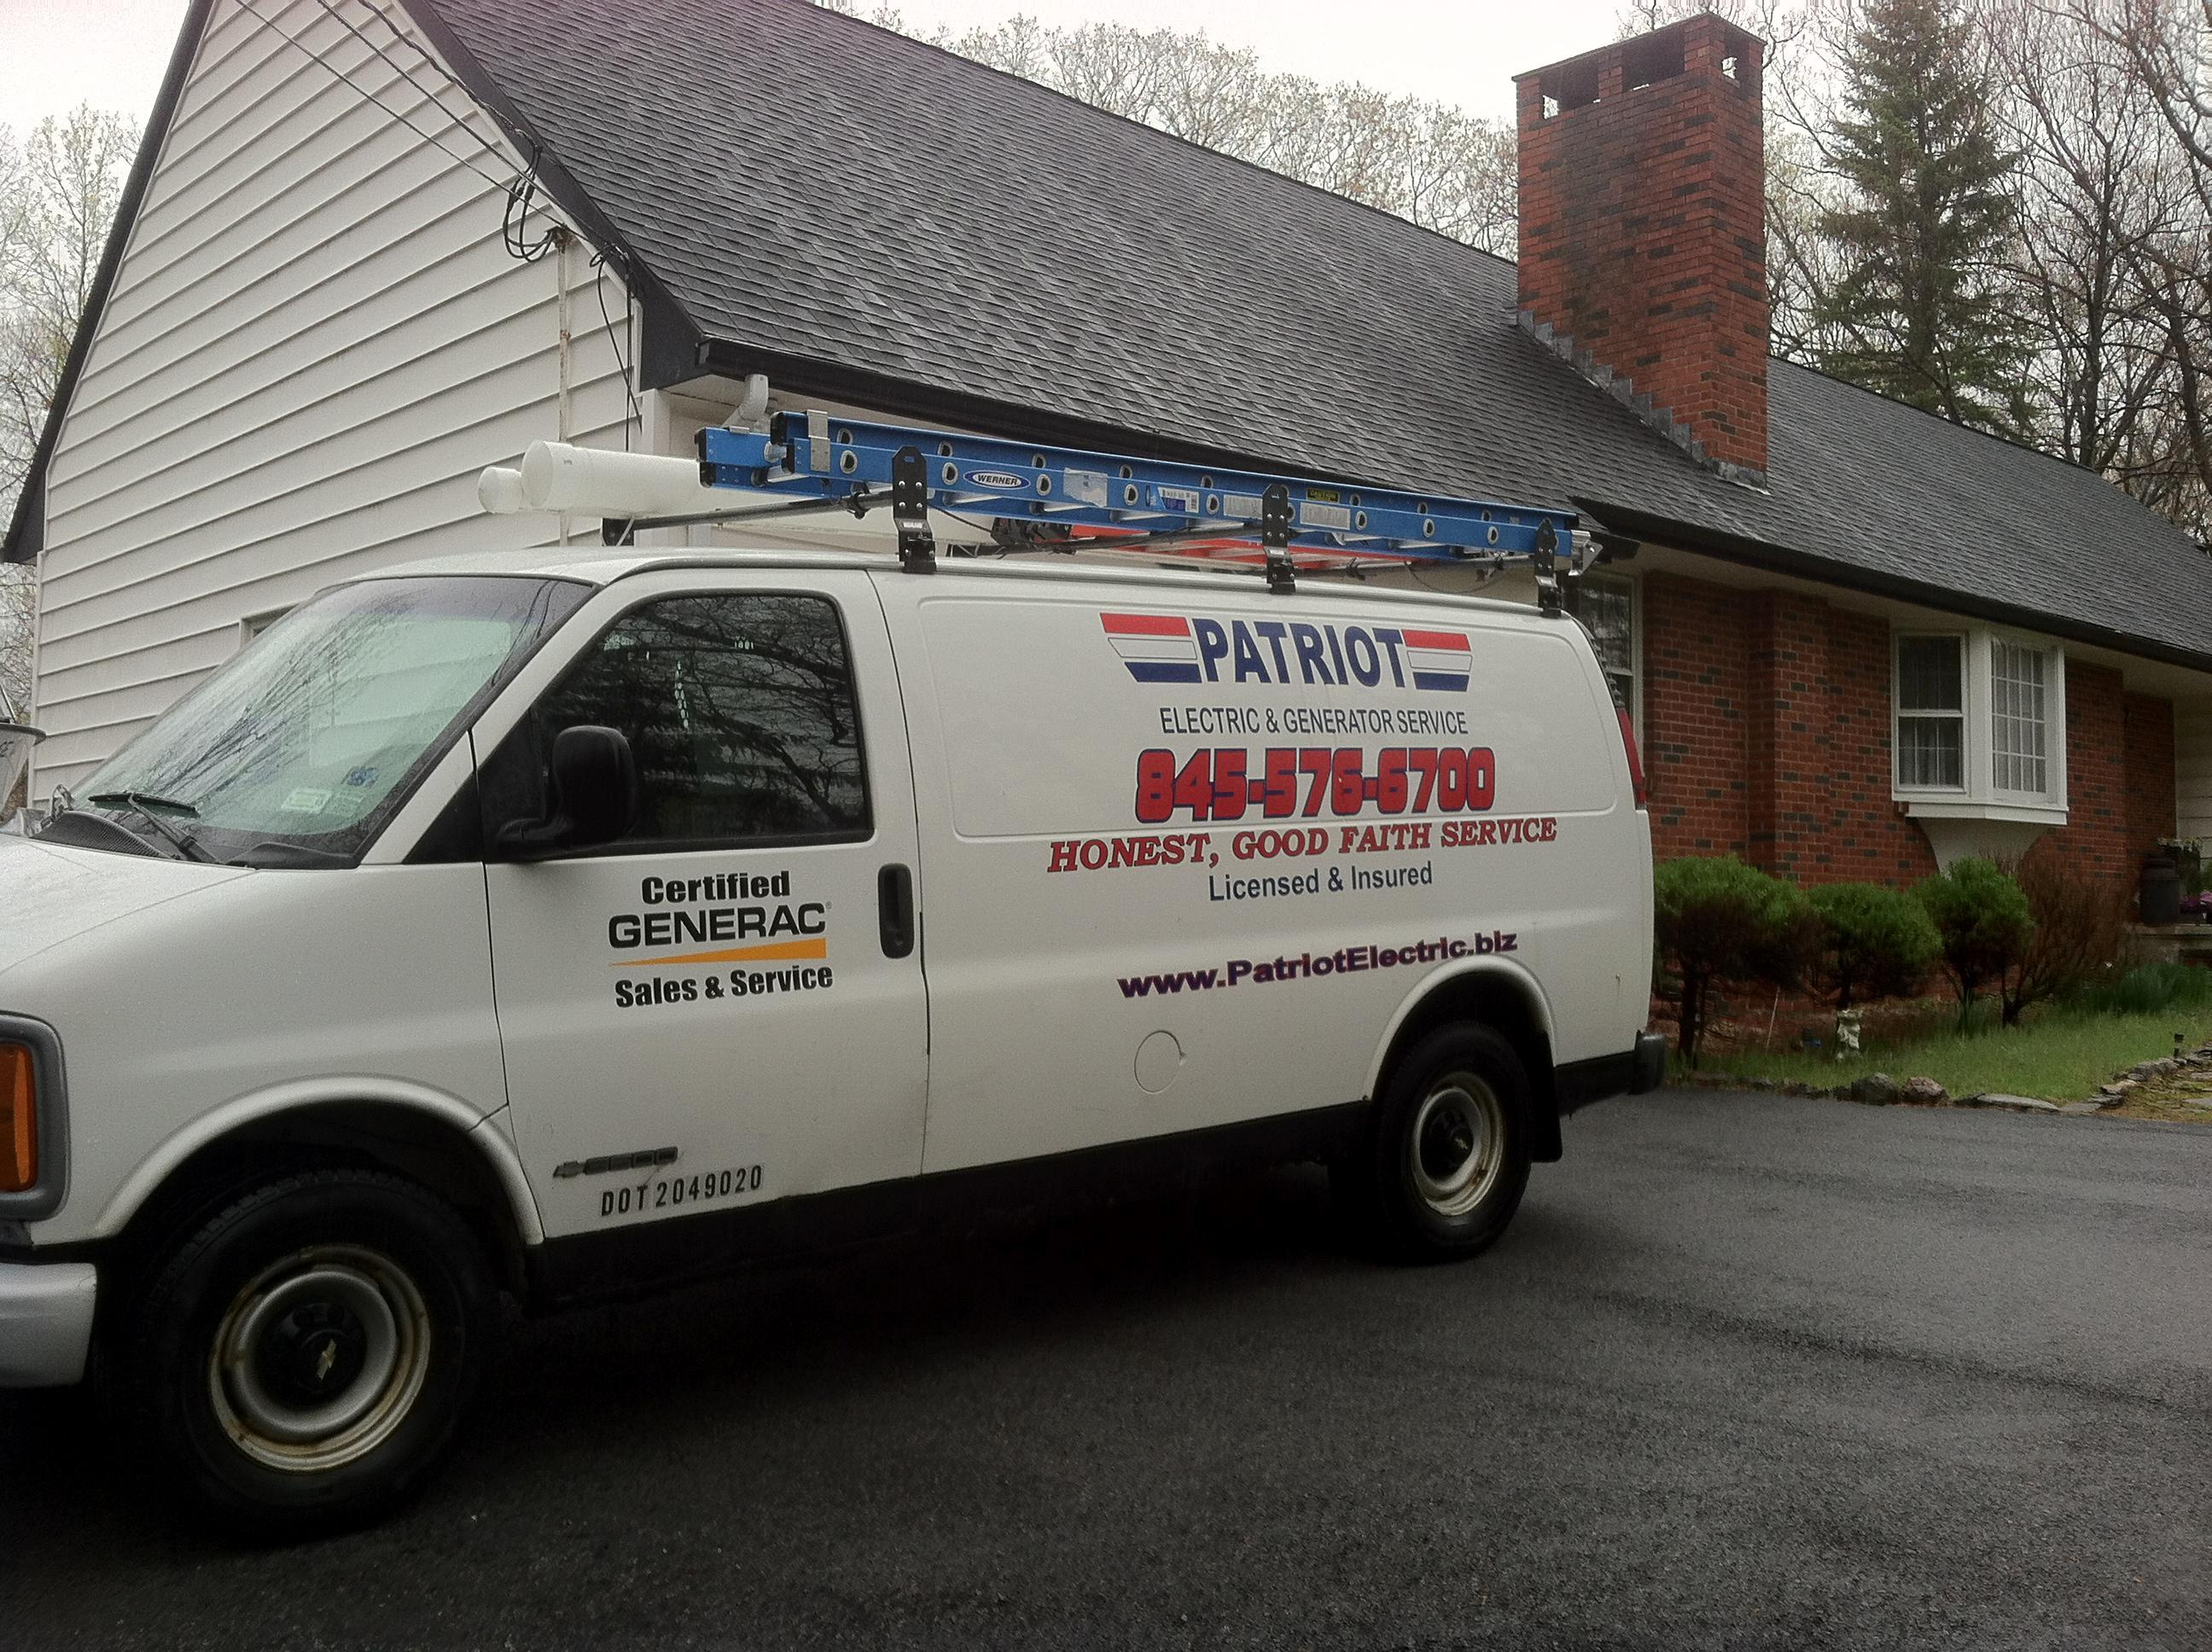 Patriot Electric & Generator Service